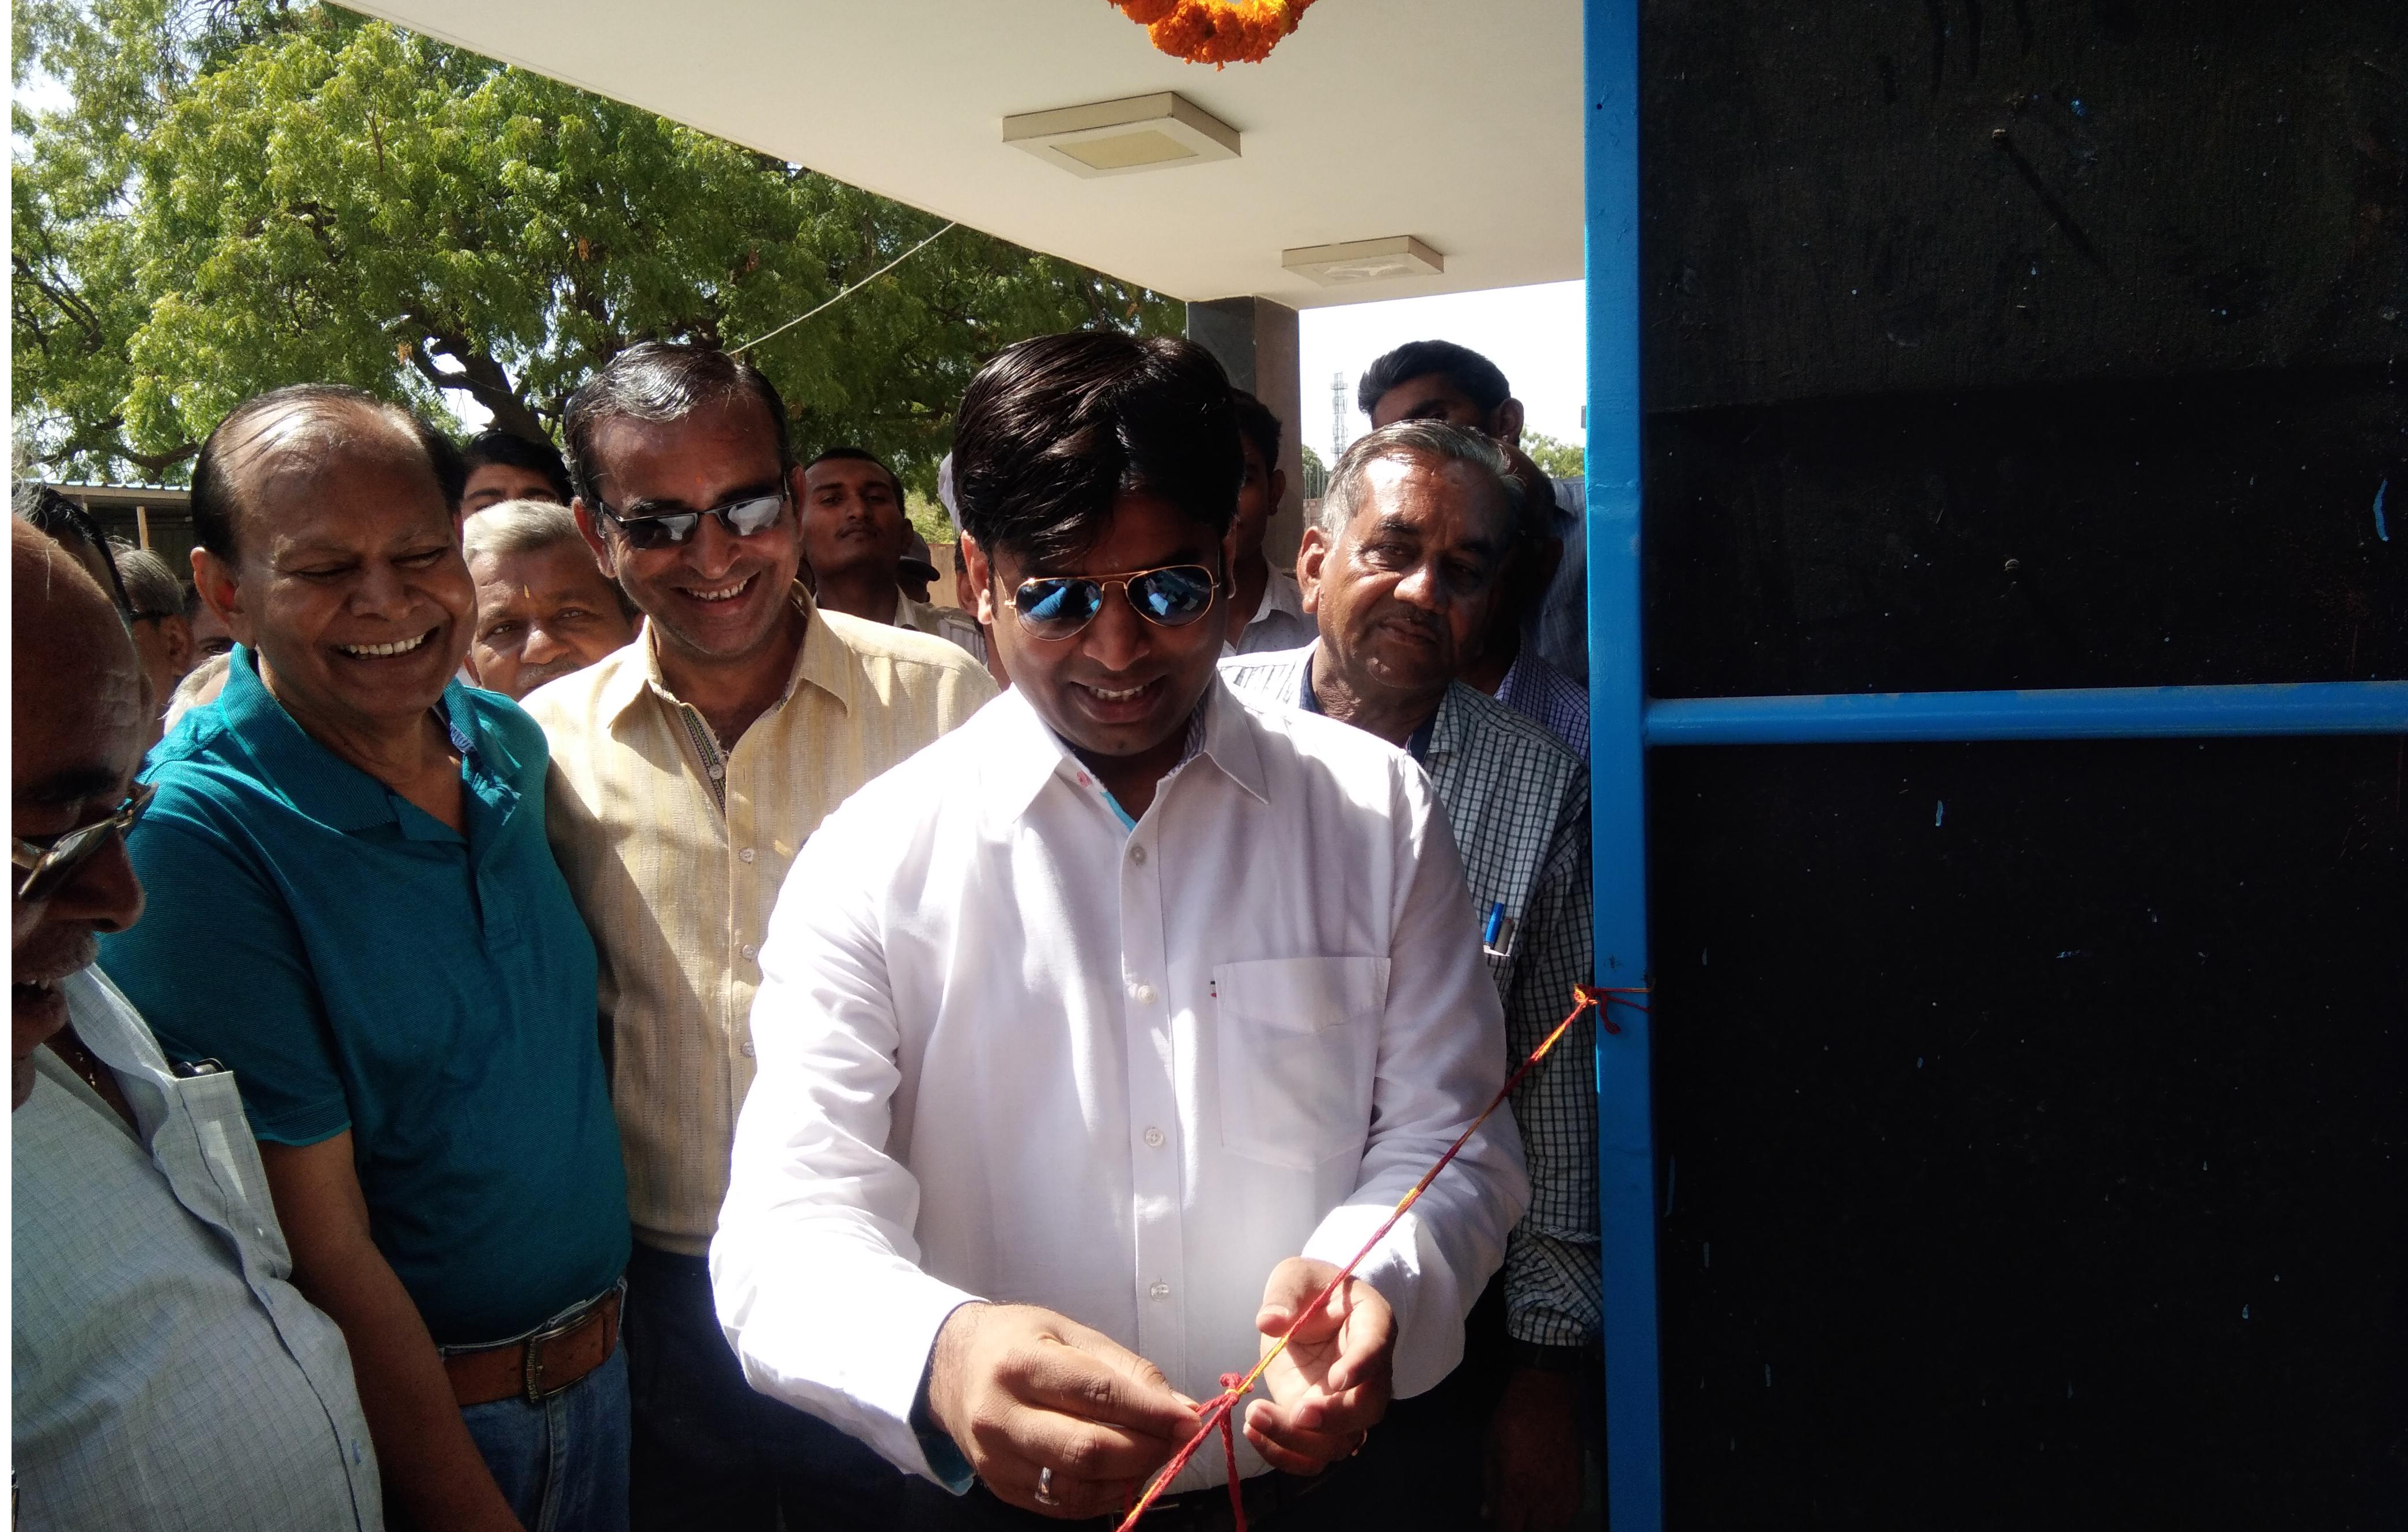 जिला कलेक्टर शिवप्रसाद एम नकाते ने किया प्याऊ का उद्घाटन